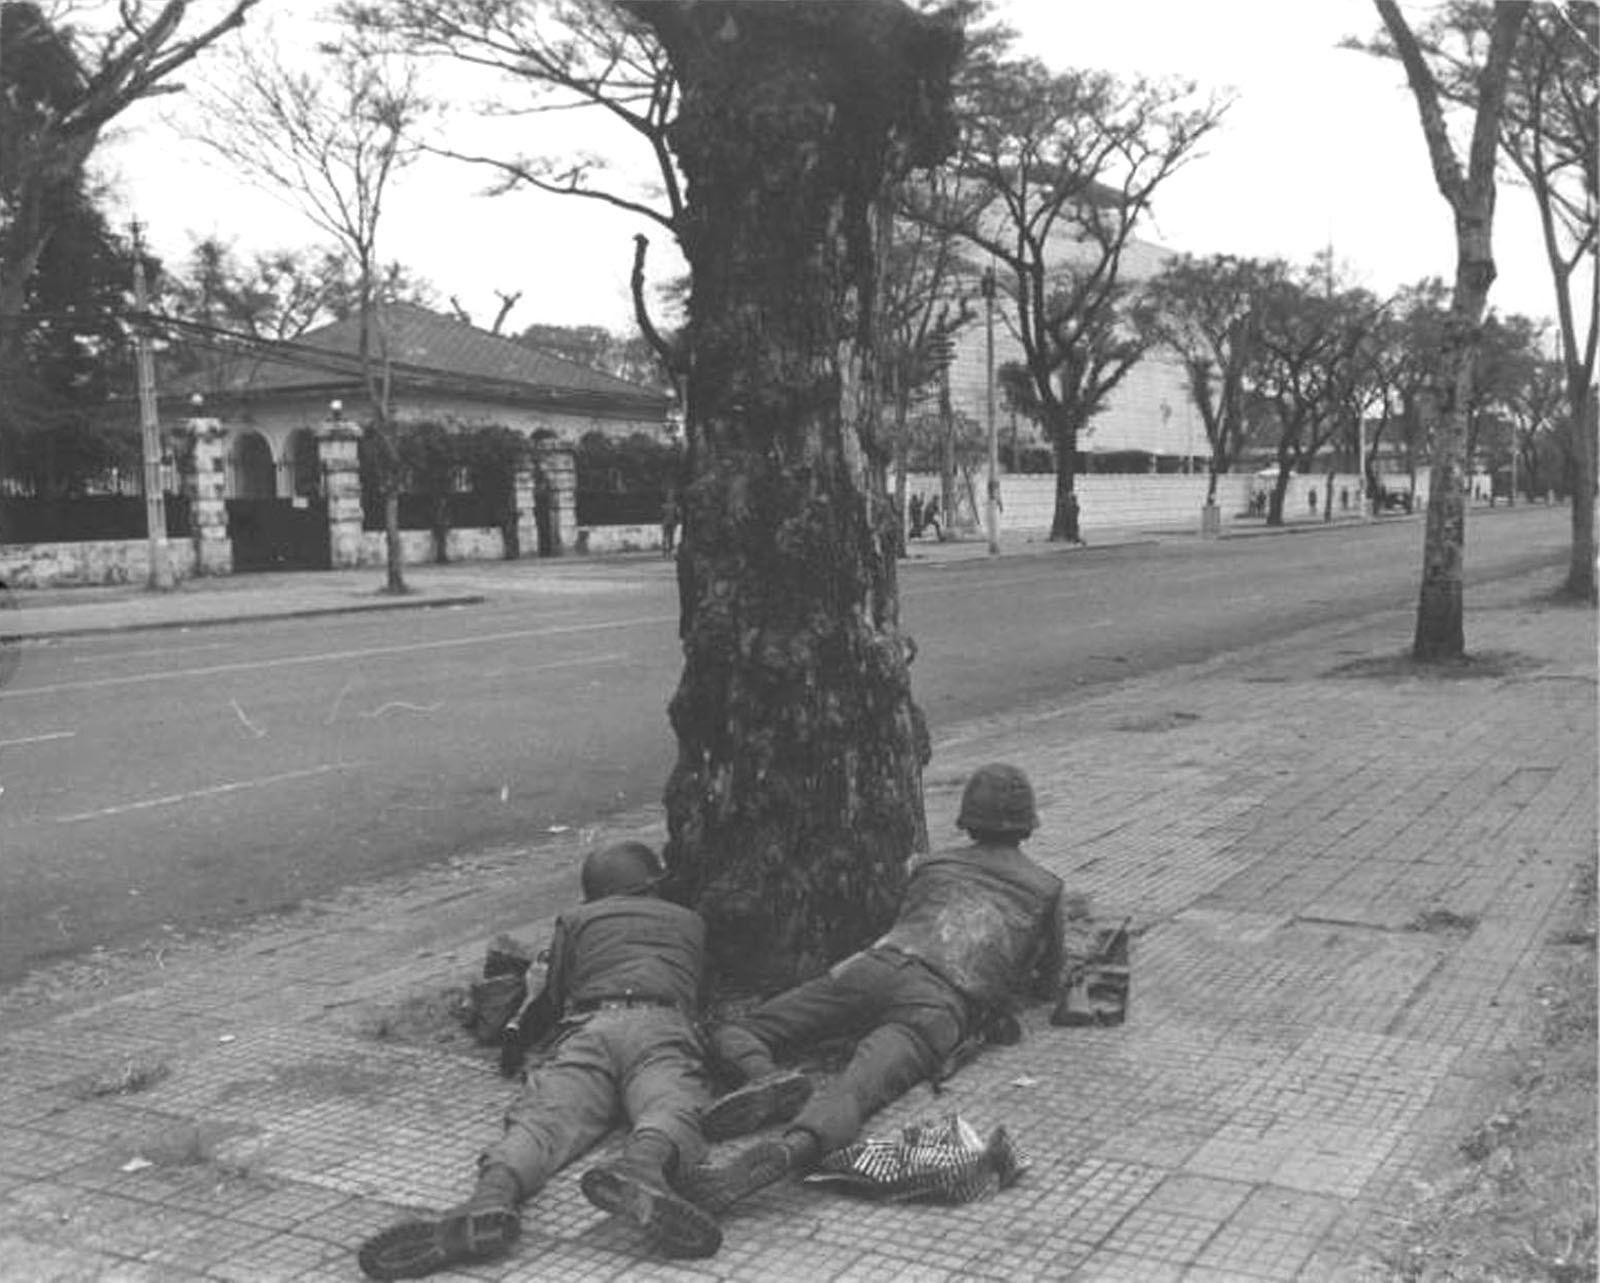 SAIGON 1968 Tet Offensive in 2020 Saigon, South